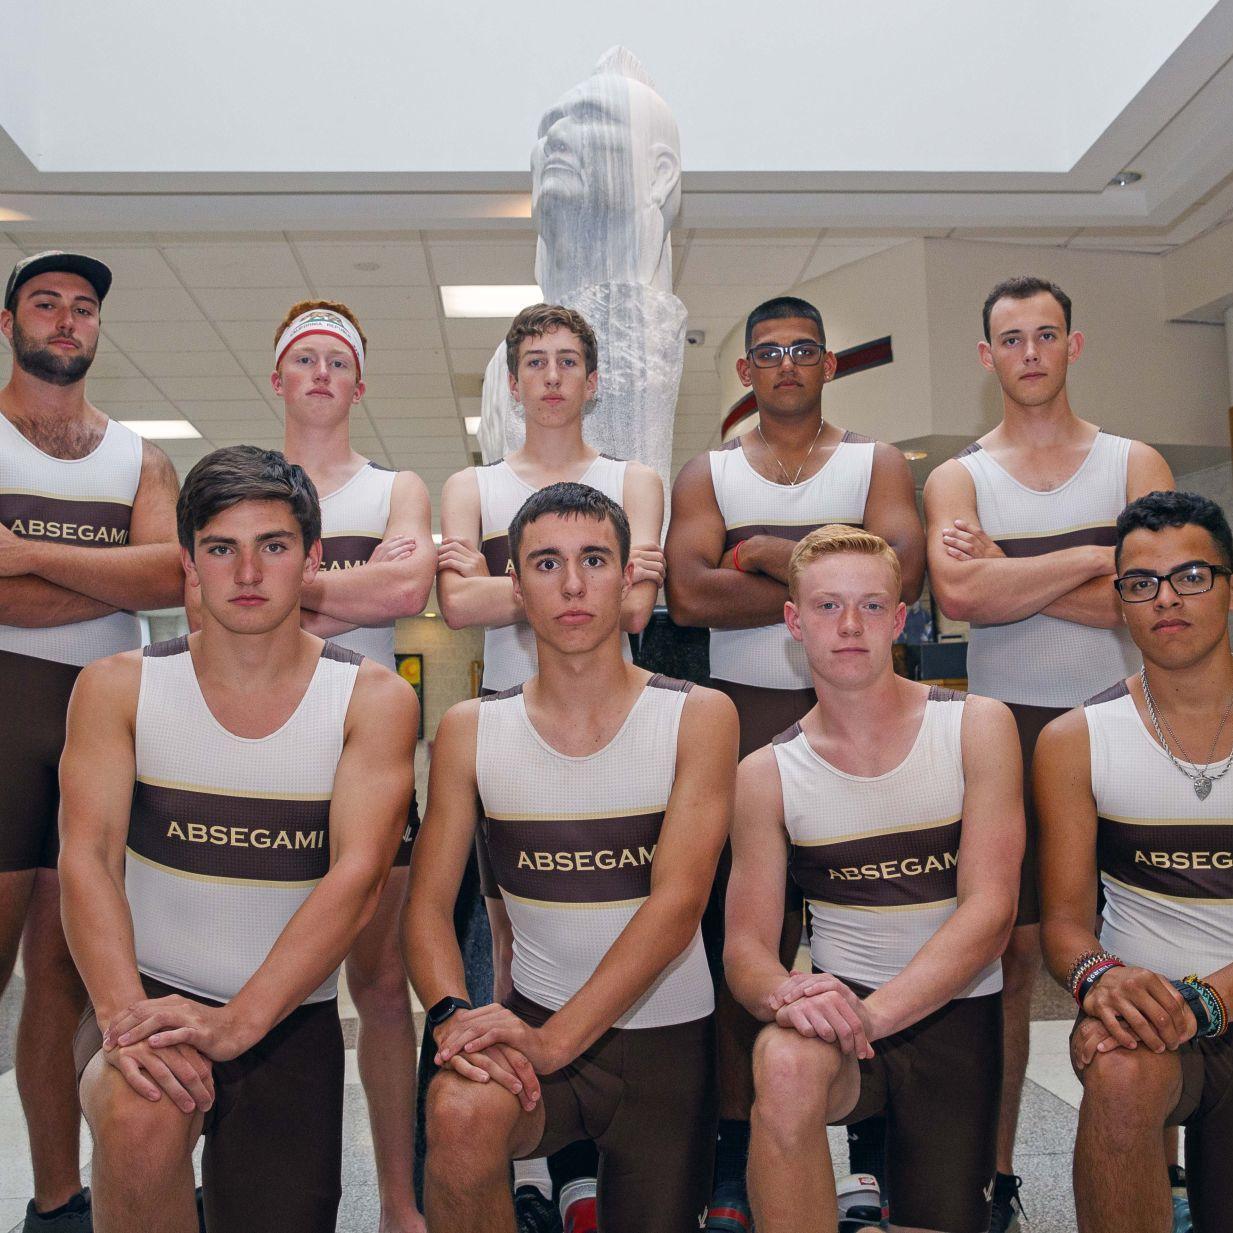 Absegami Is The Press Boys Crew Team Of The Year Atlantic City Sports News Pressofatlanticcity Com